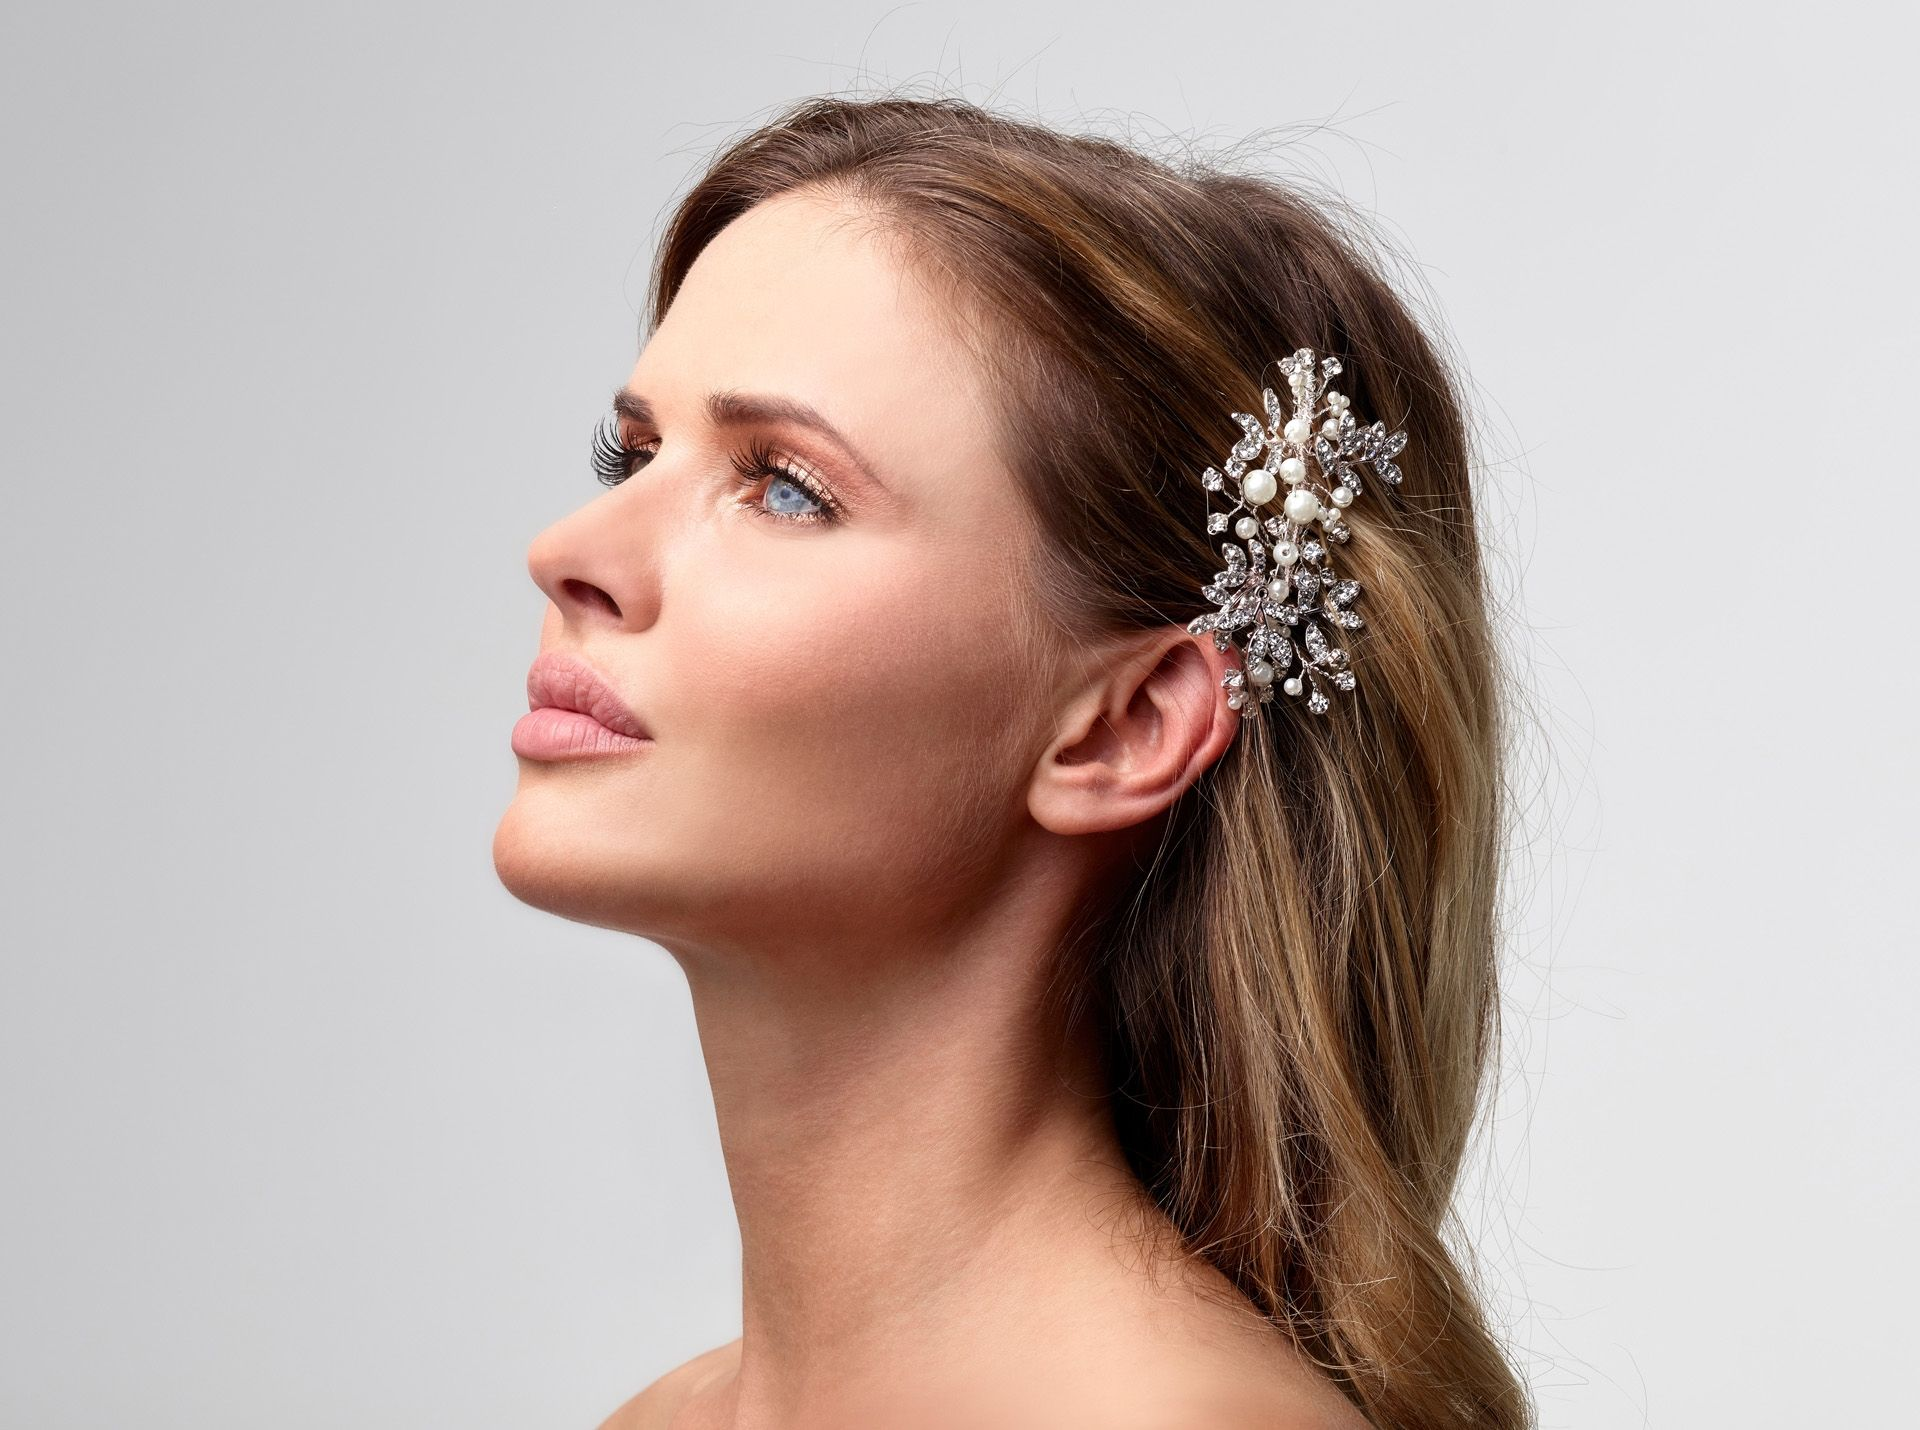 Mooi haar accessoire van Poirier  Bruids accessoires  Pinterest